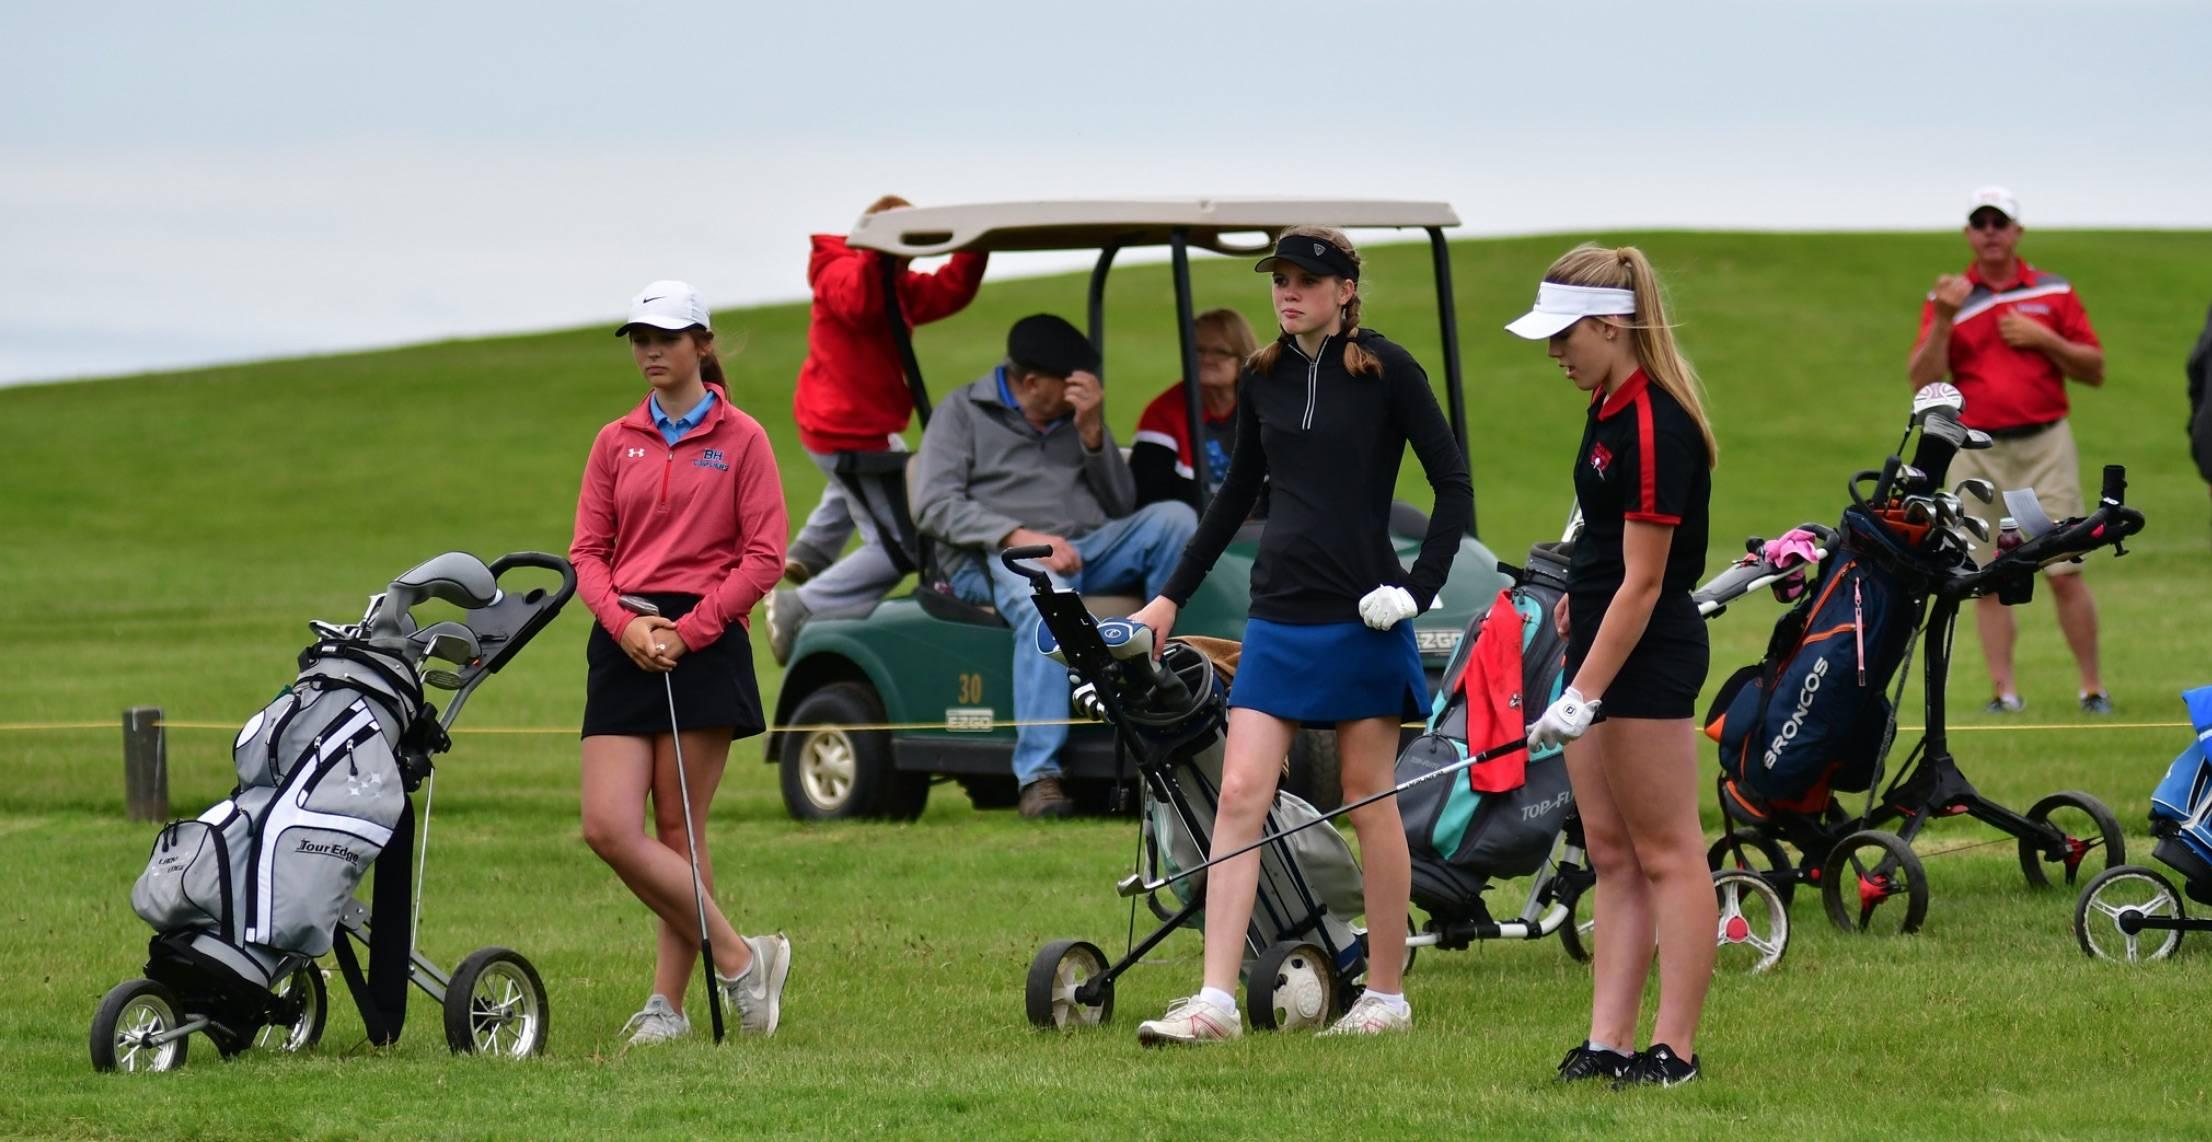 Girl golfers